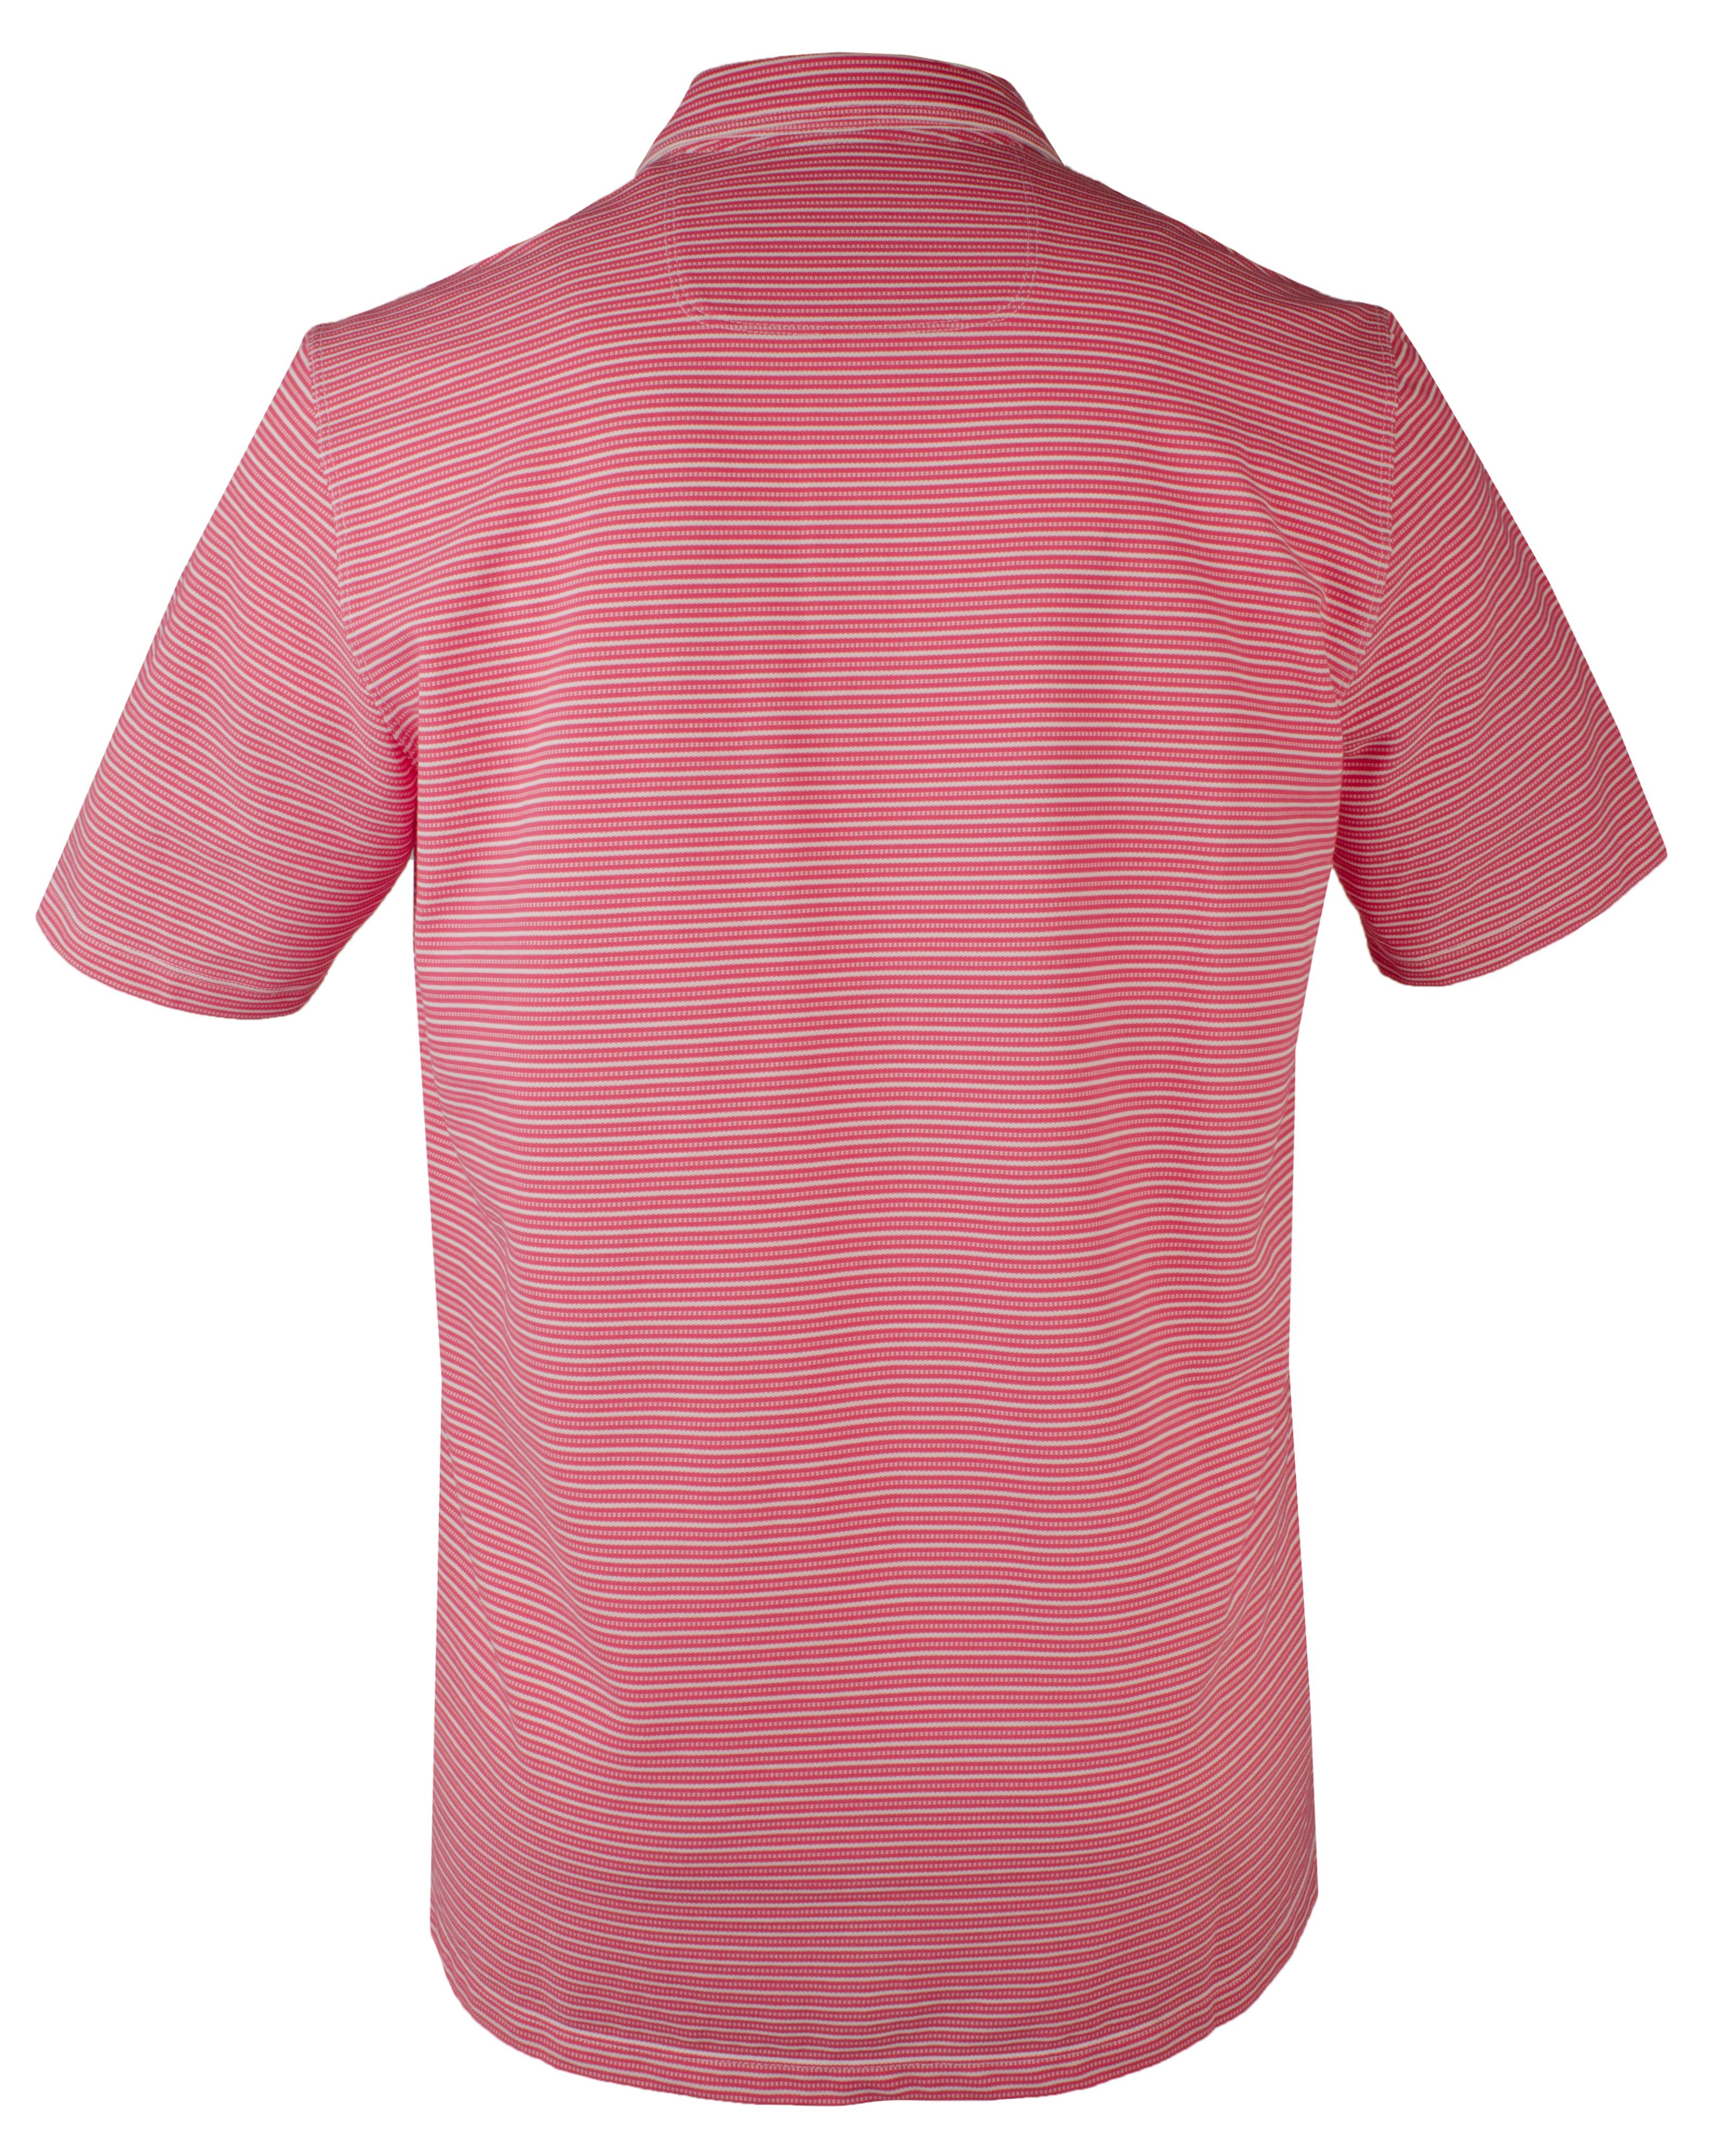 Tommy-Bahama-Men-039-s-Big-amp-Tall-Marina-Marlin-IslandZone-Polo-Shirt thumbnail 5